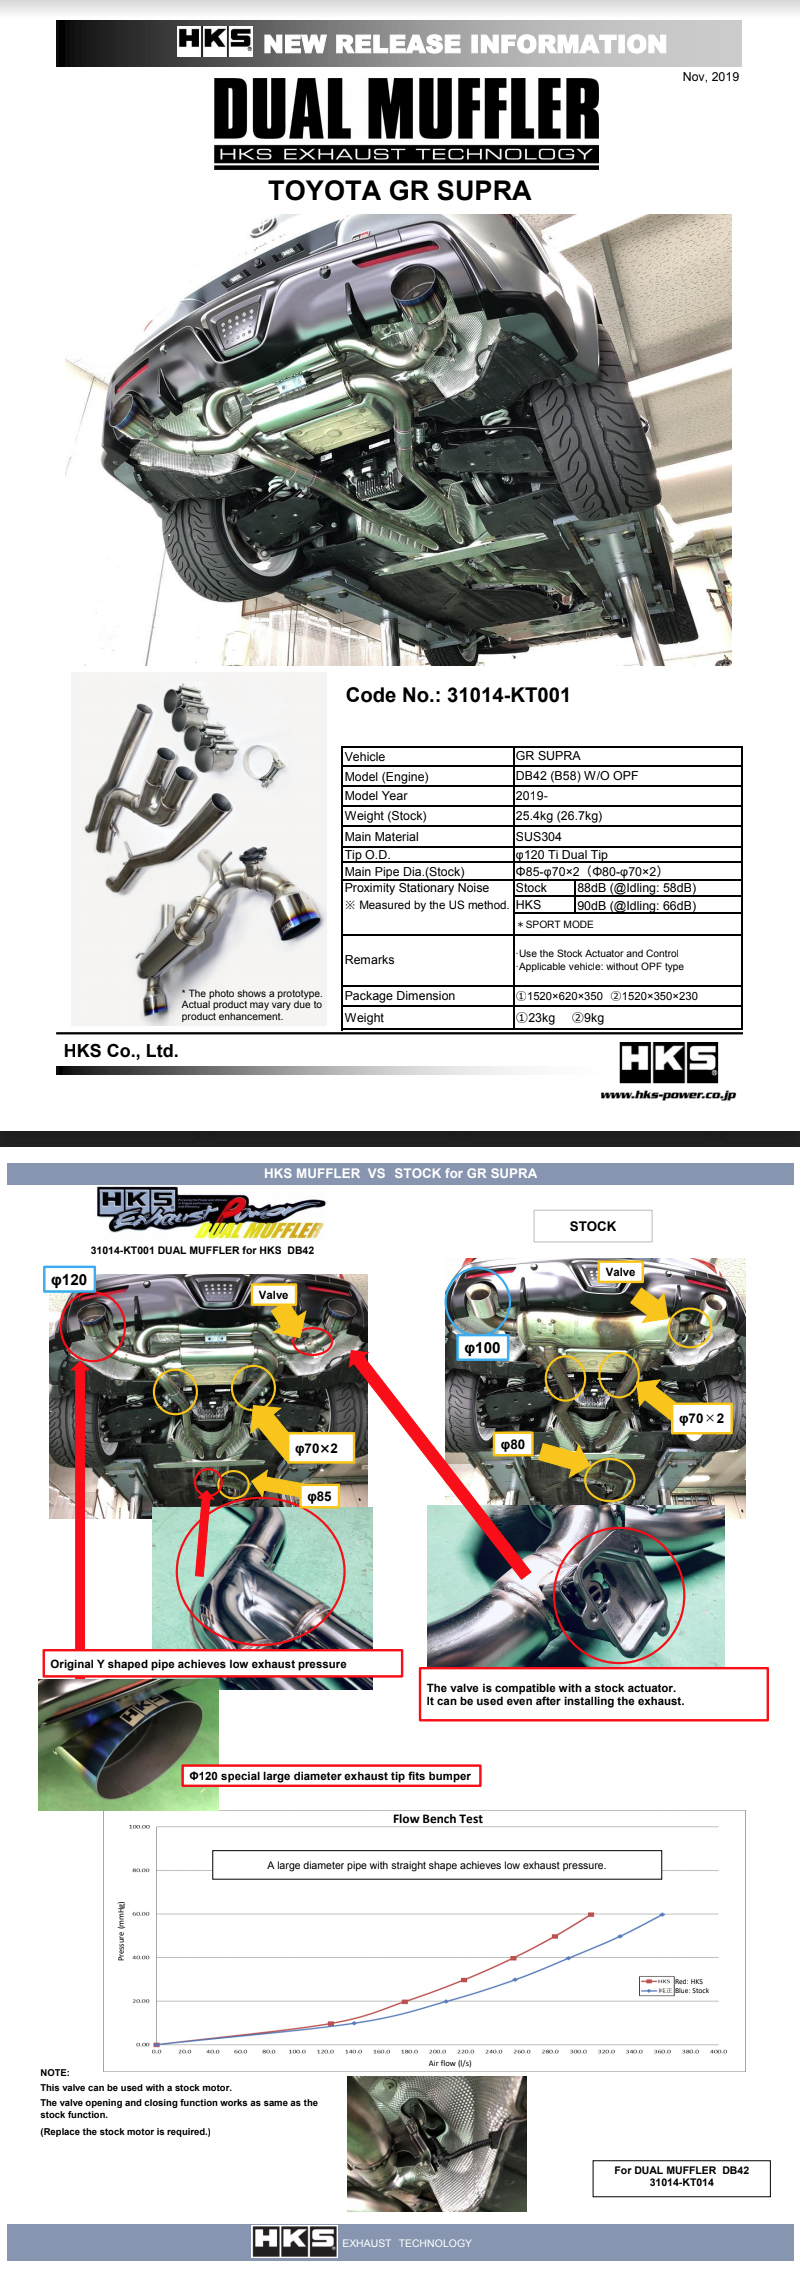 hks-a90-dualmuffler.jpg